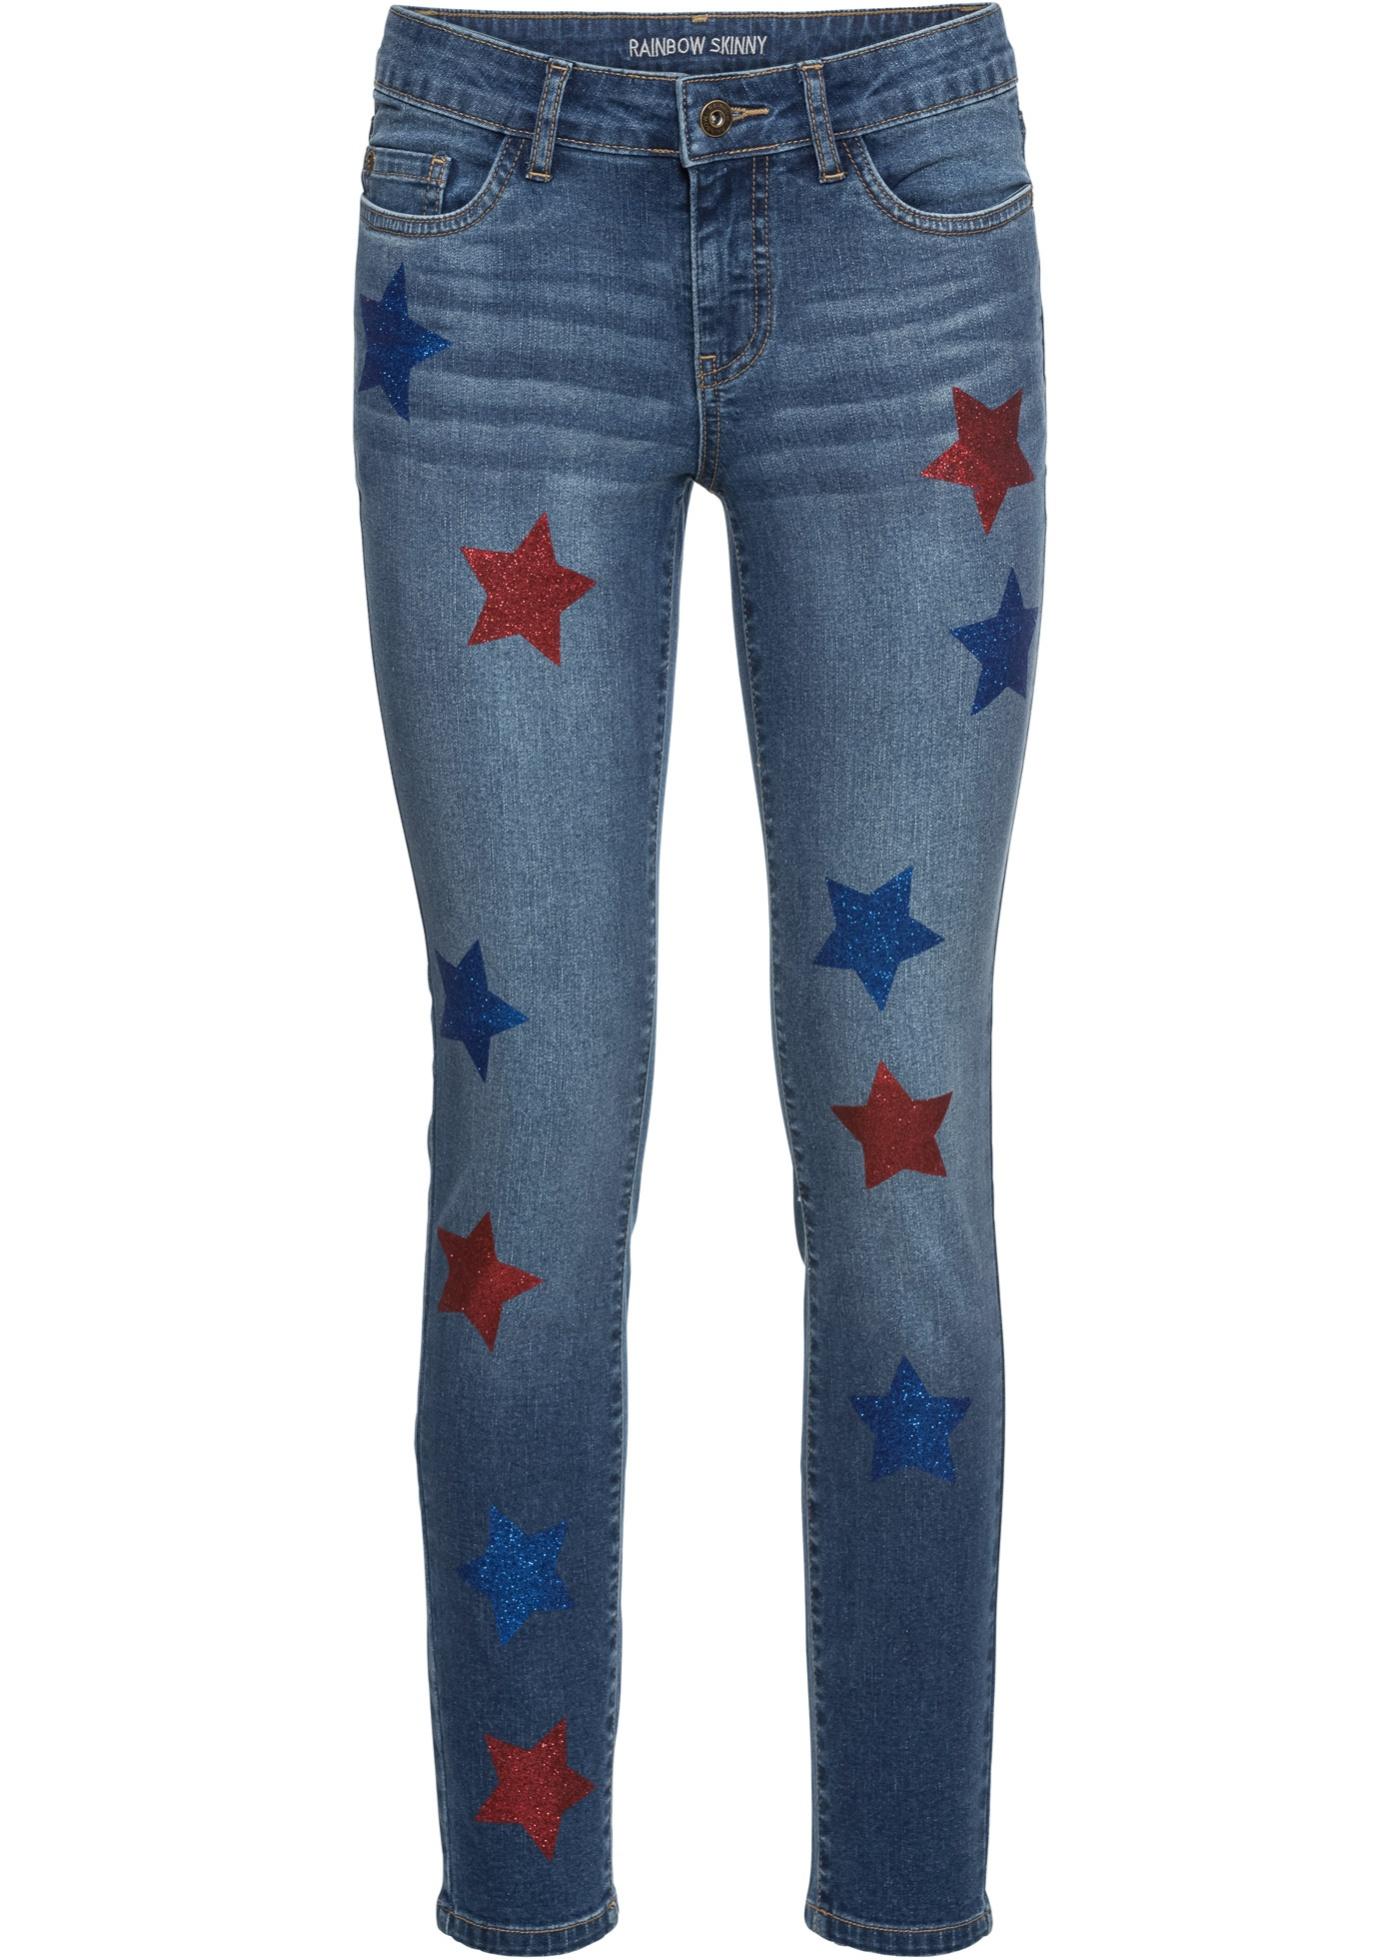 Hosen - Verkürzte Skinny Jeans mit Sternen › bonprix › blau  - Onlineshop Bonprix